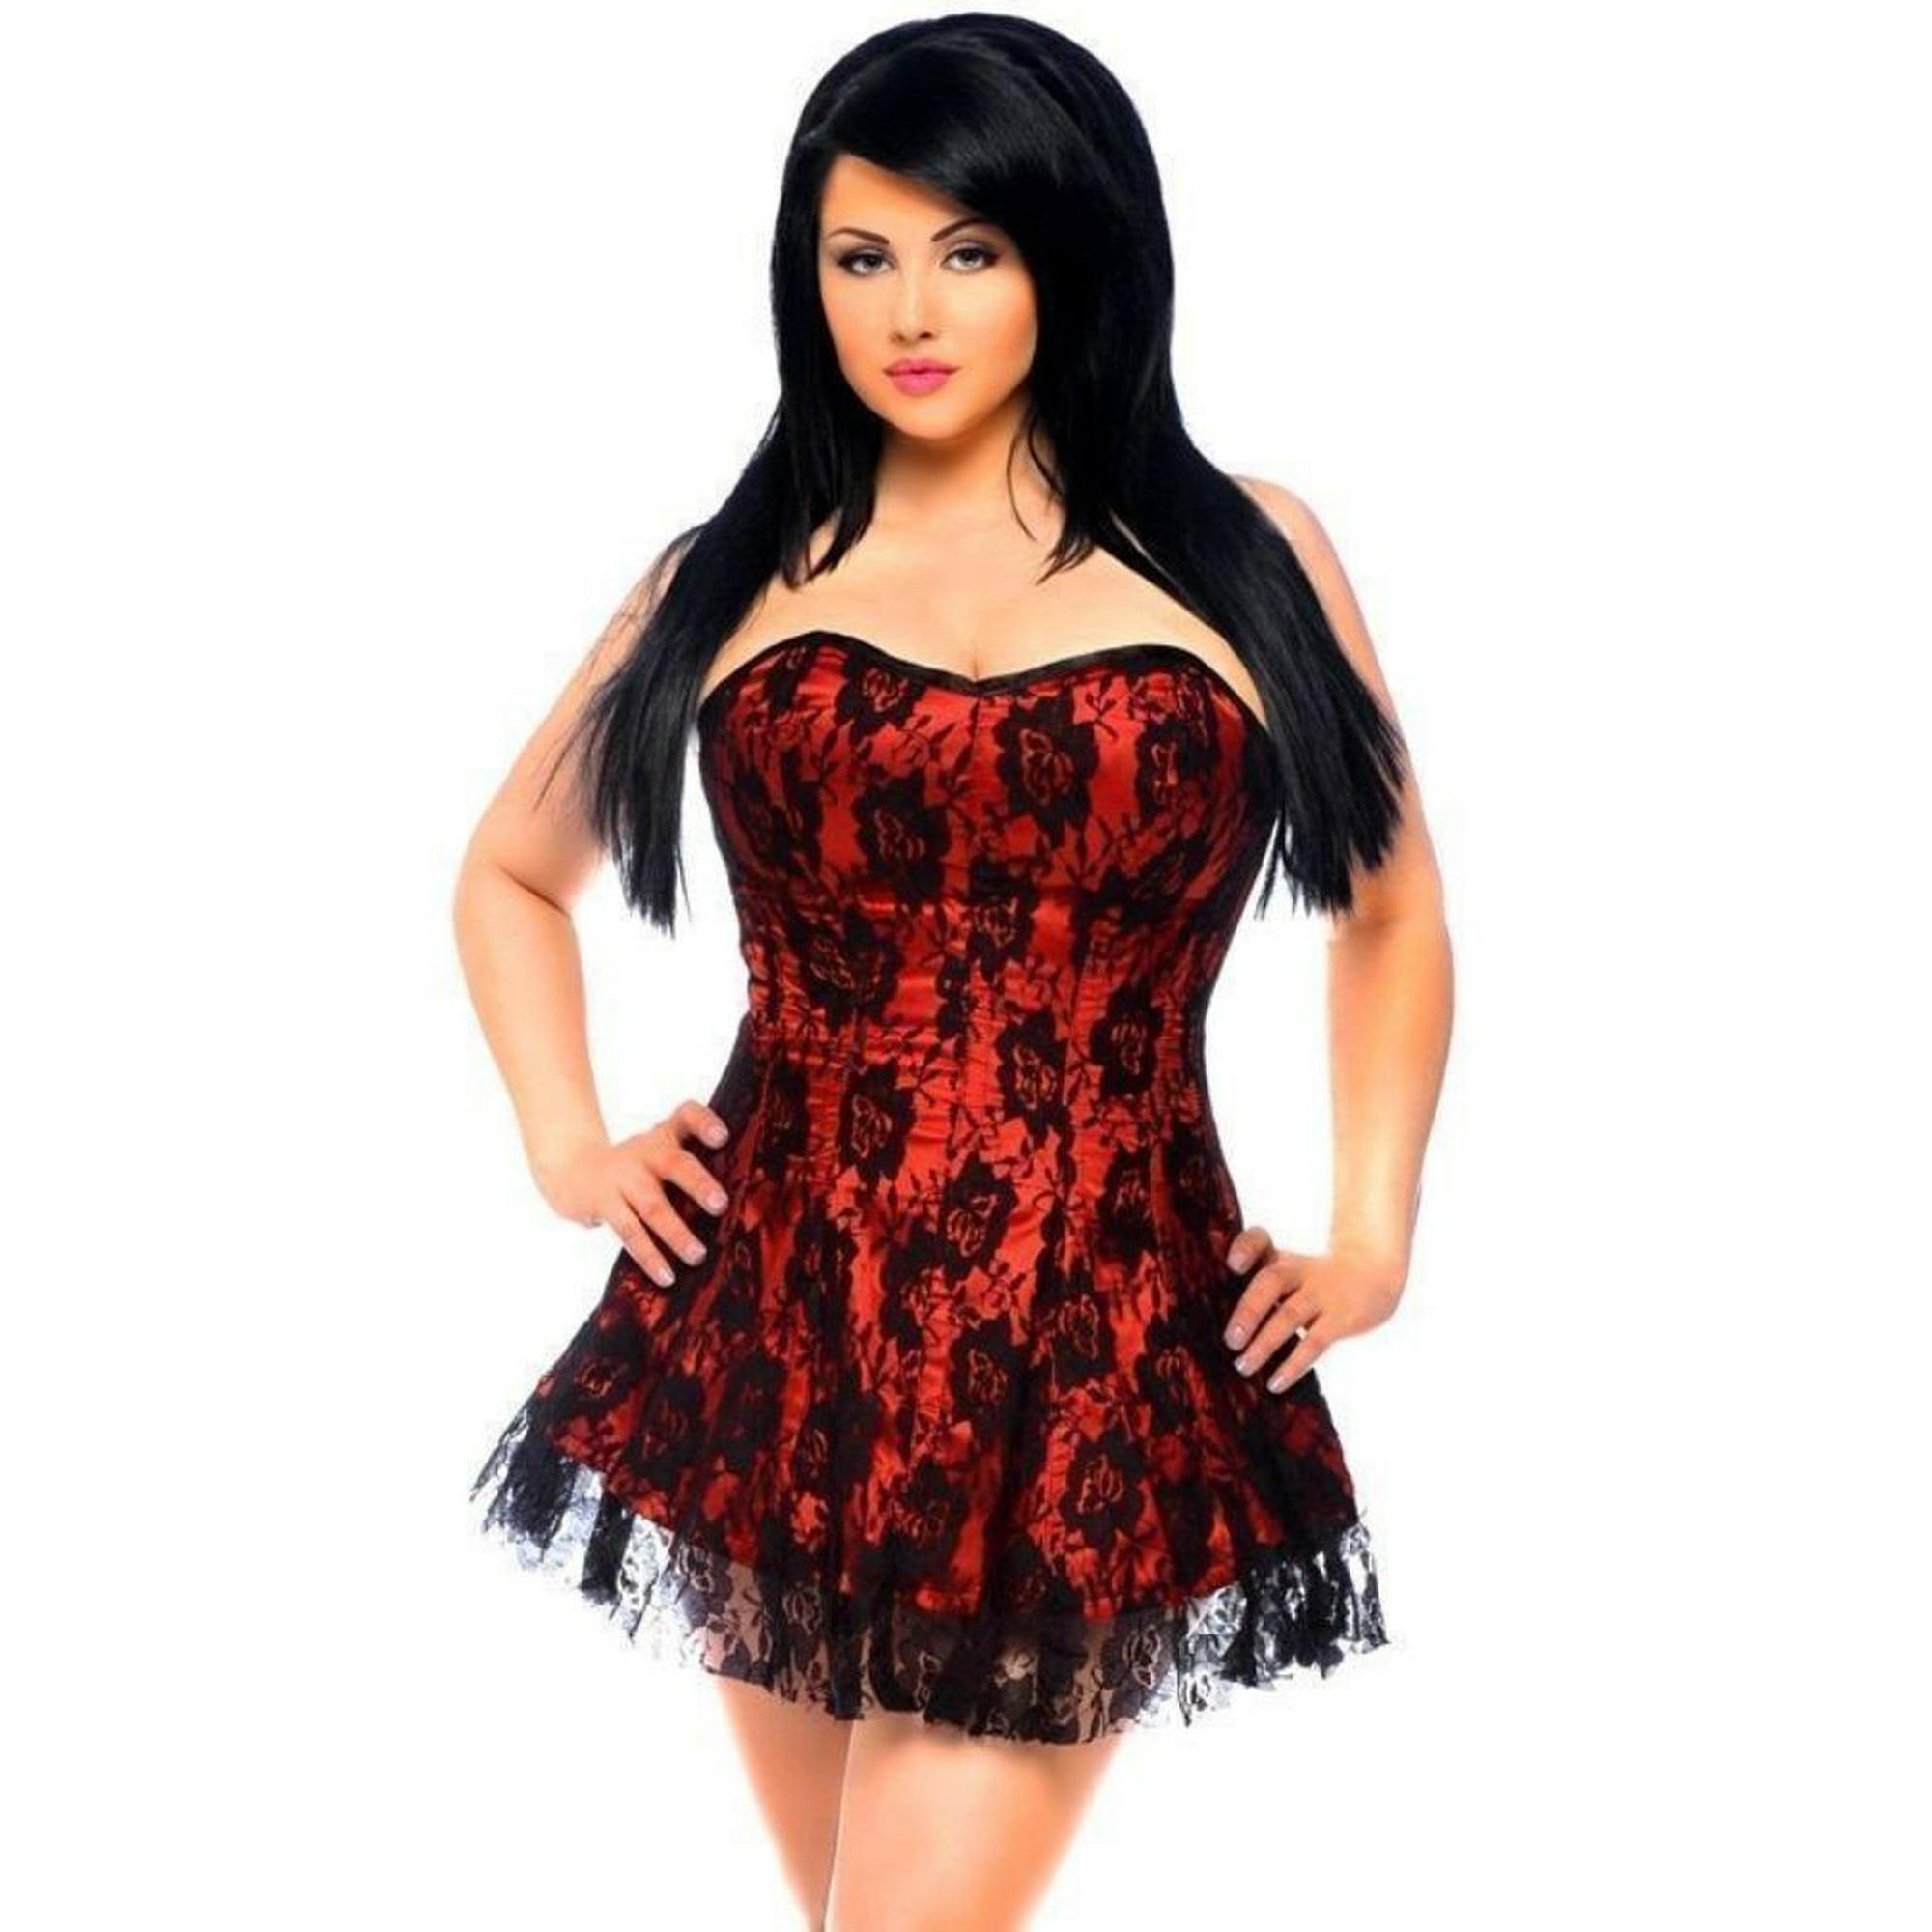 03e3e54ee2 Daisy Corsets Lavish Red Black Lace Dress Front Zipper Sexy Lingerie 2x-6x  Plus